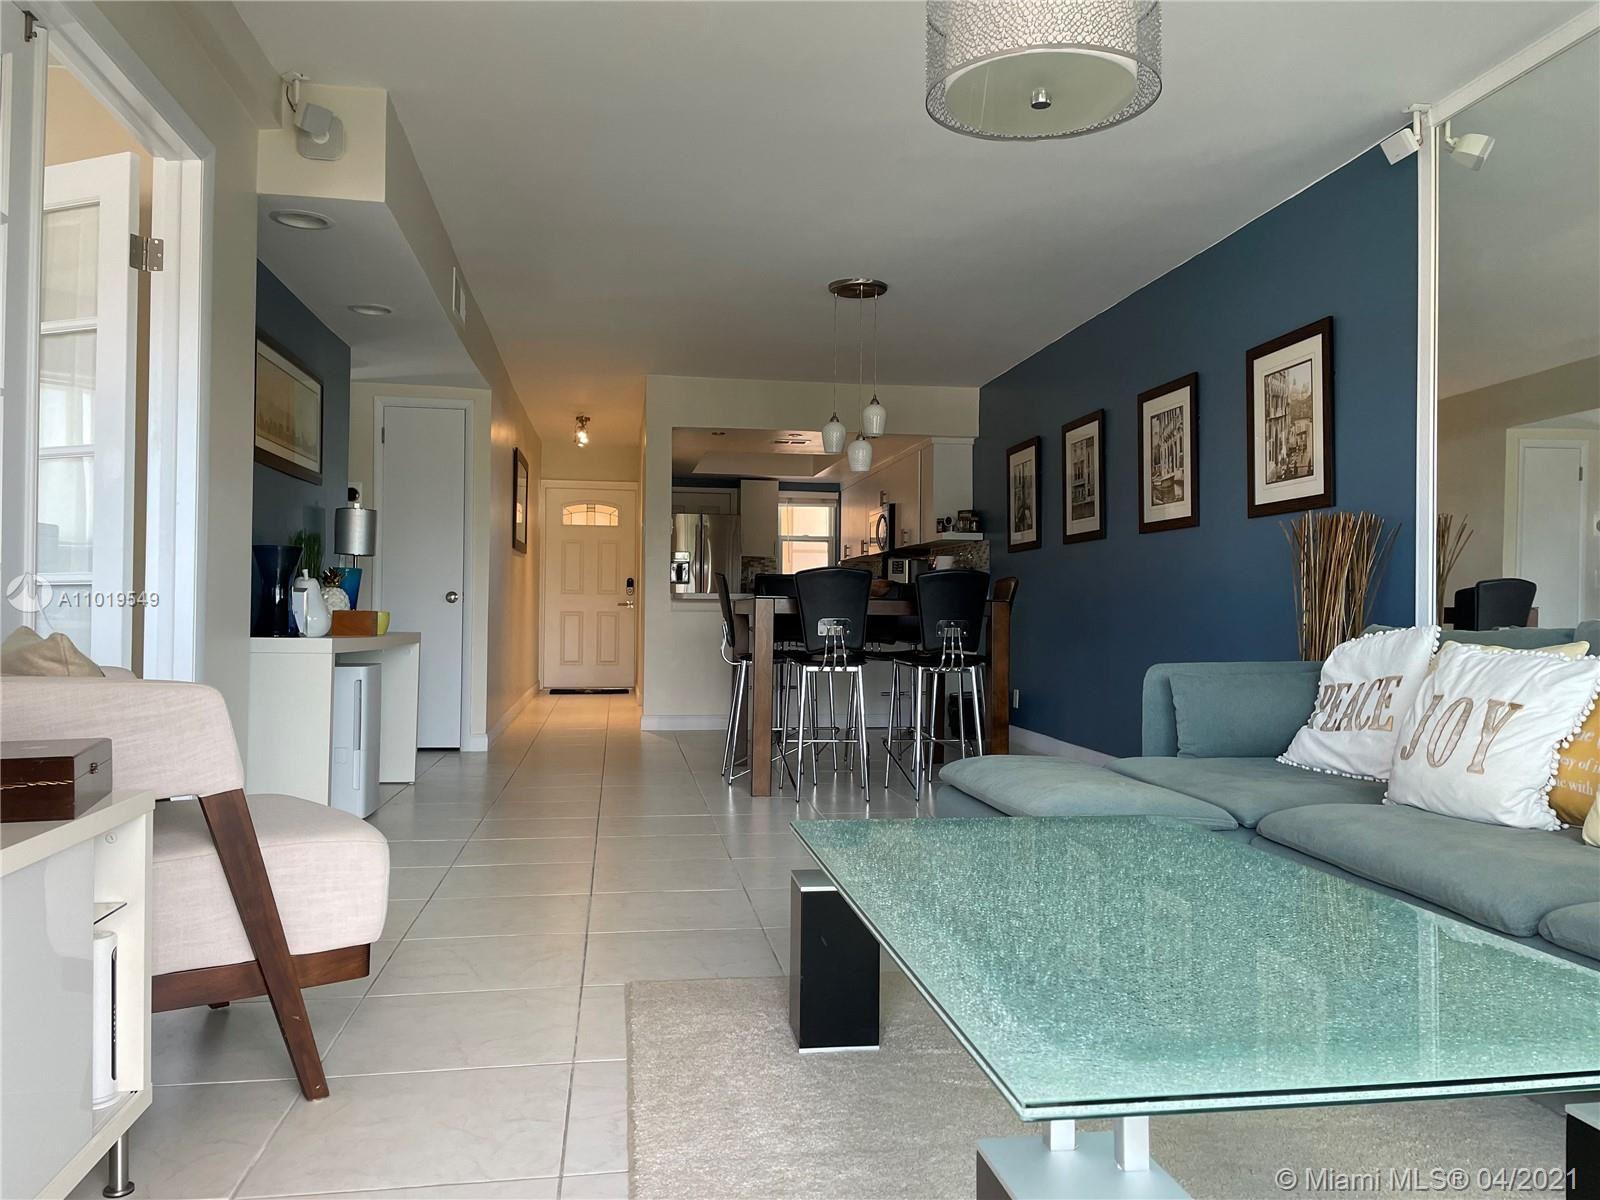 2841 NE 33rd Ct #306, Fort Lauderdale, FL 33306 - #: A11019549